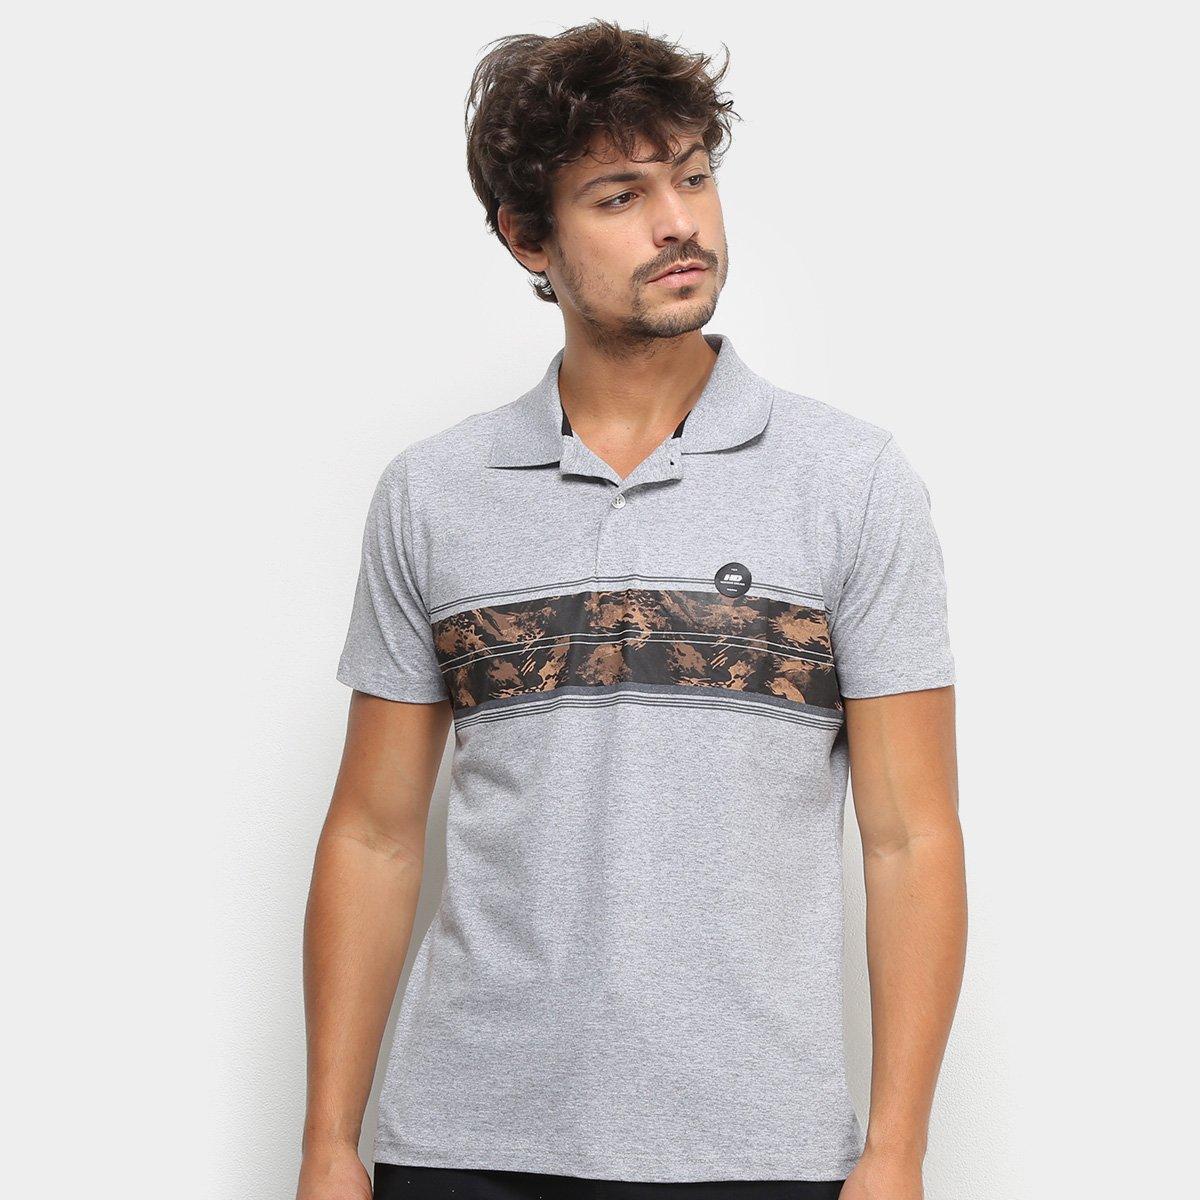 Camisa Polo HD Polo Gijoe Masculina